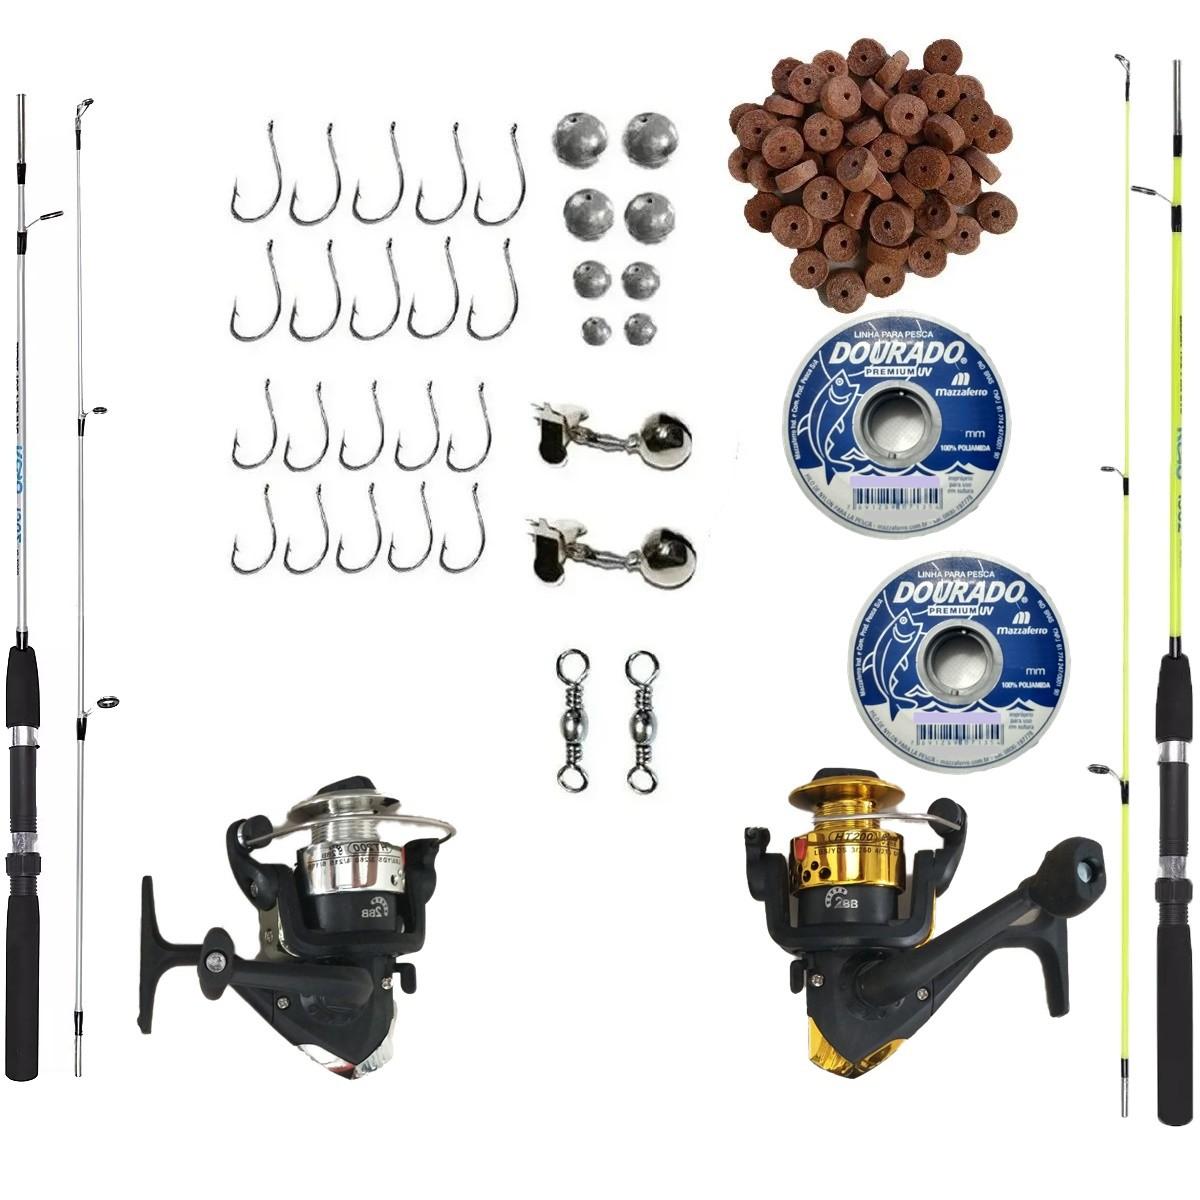 Kit De Pesca Completo 2 Varas 2 Molinetes Acessórios Barato